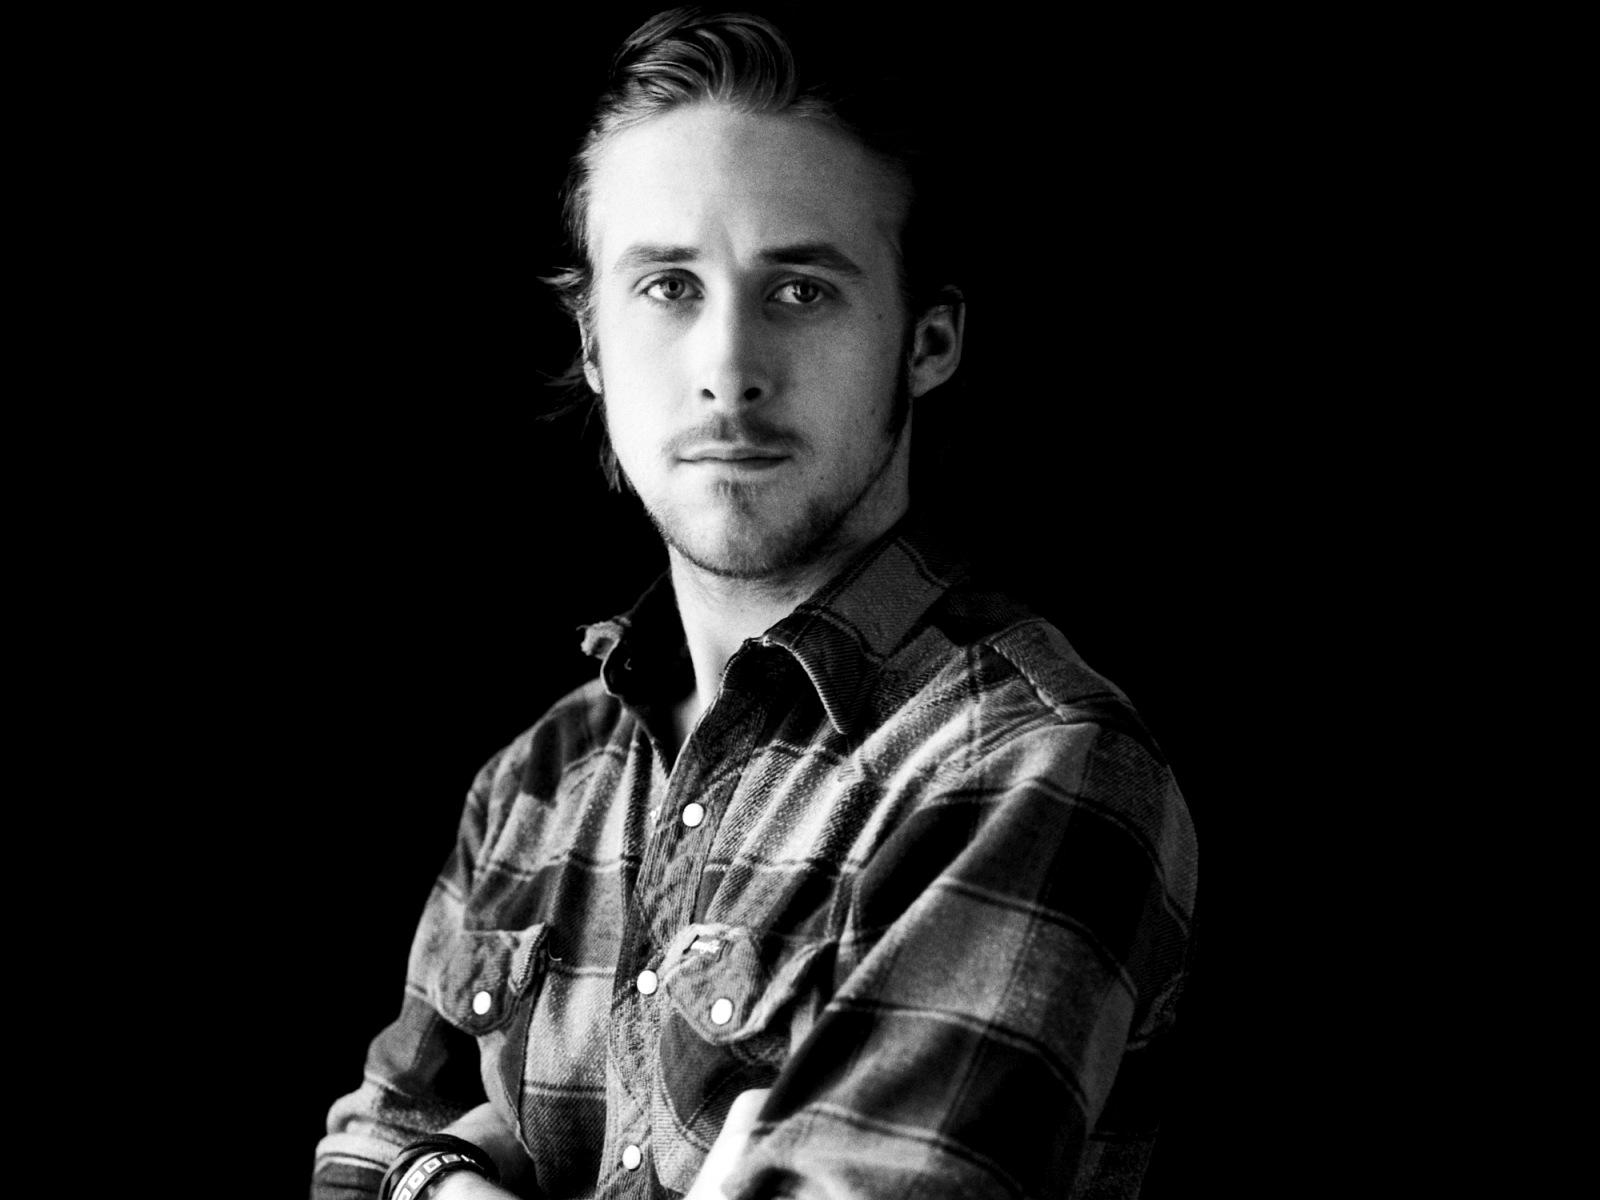 Ryan Gosling HD Wallpapers for desktop download 1600x1200